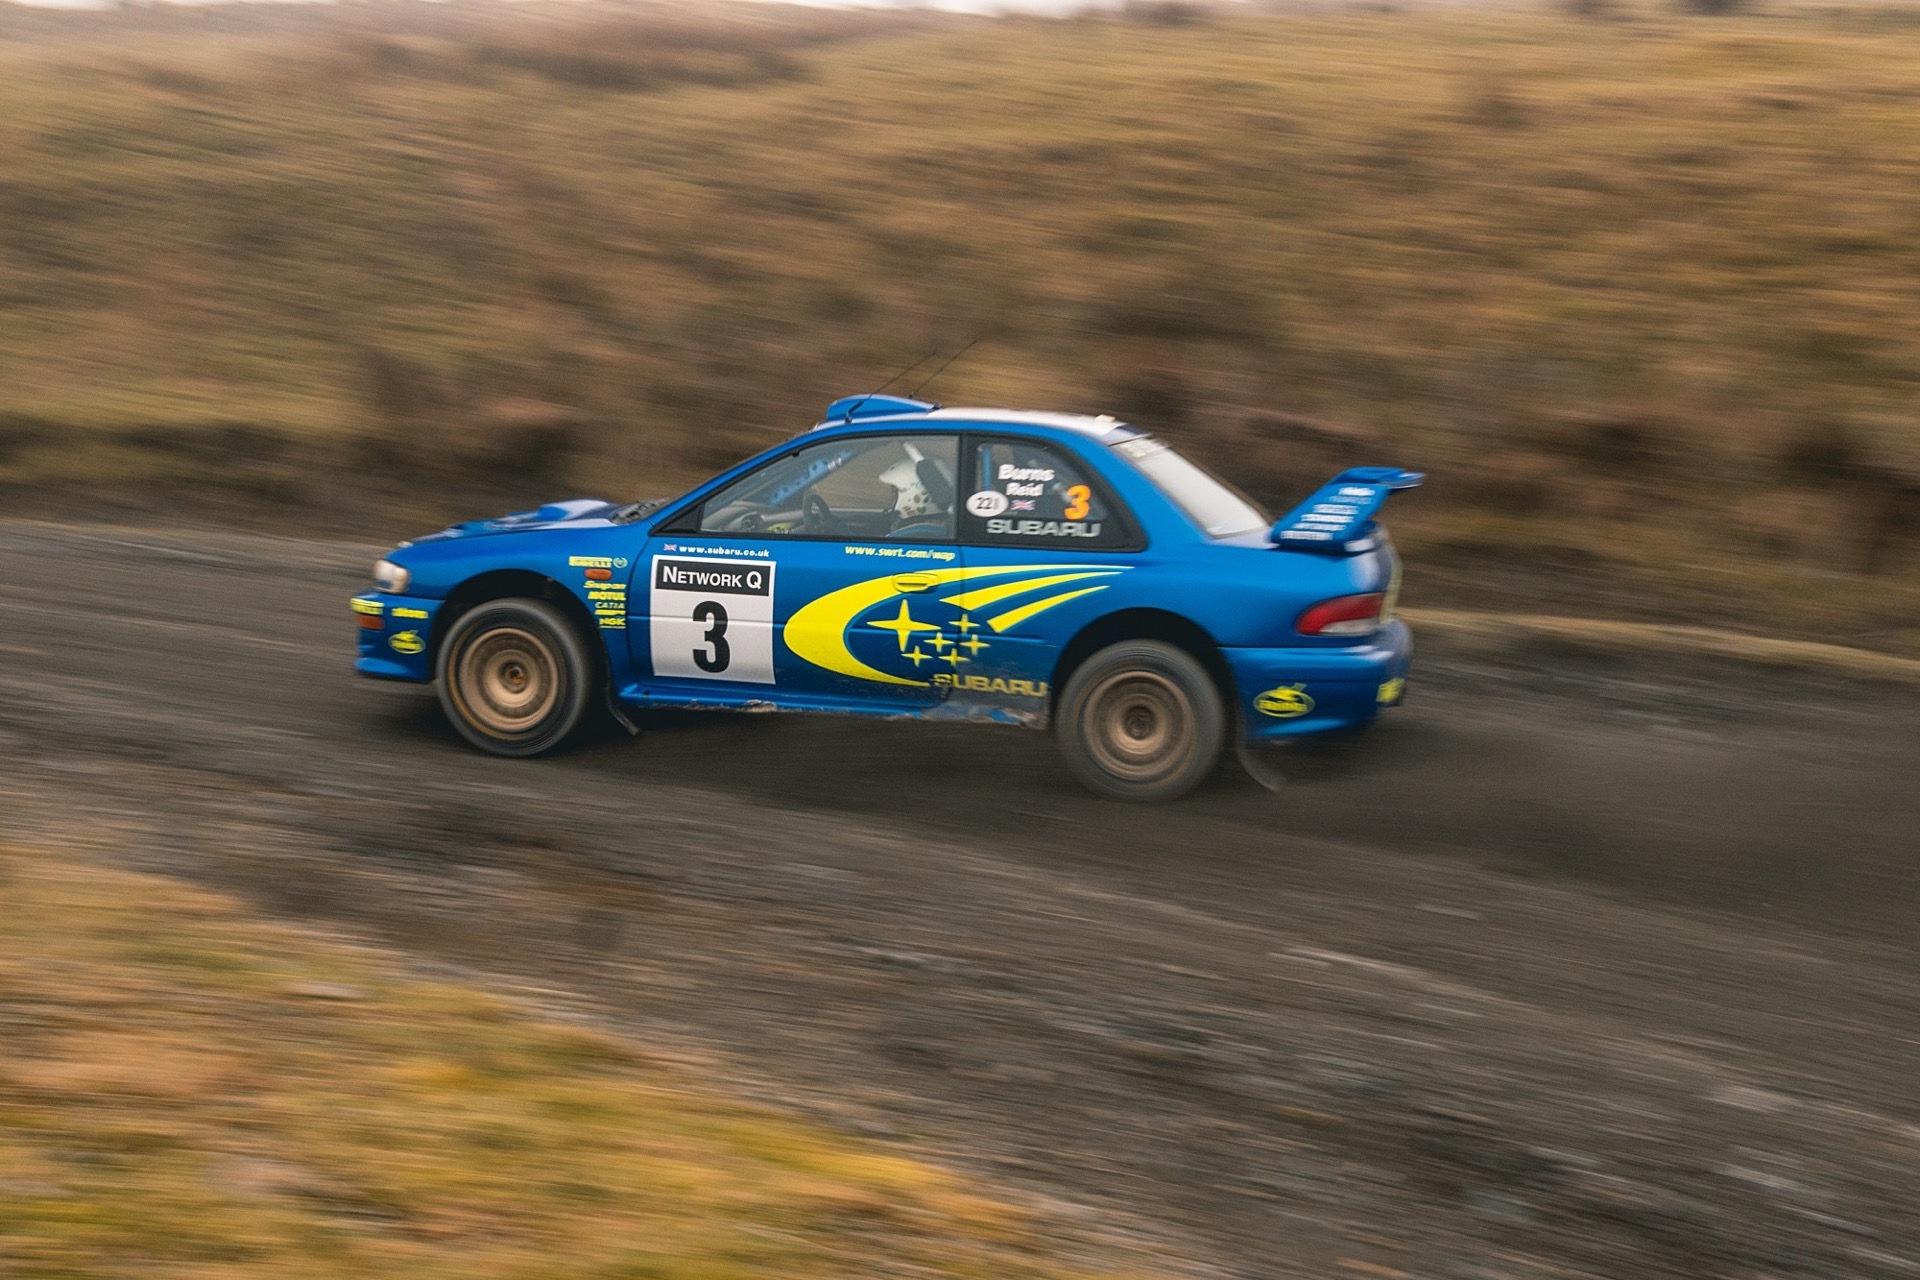 Richard_Burns_Subaru_Impreza_WRC_sale-0021